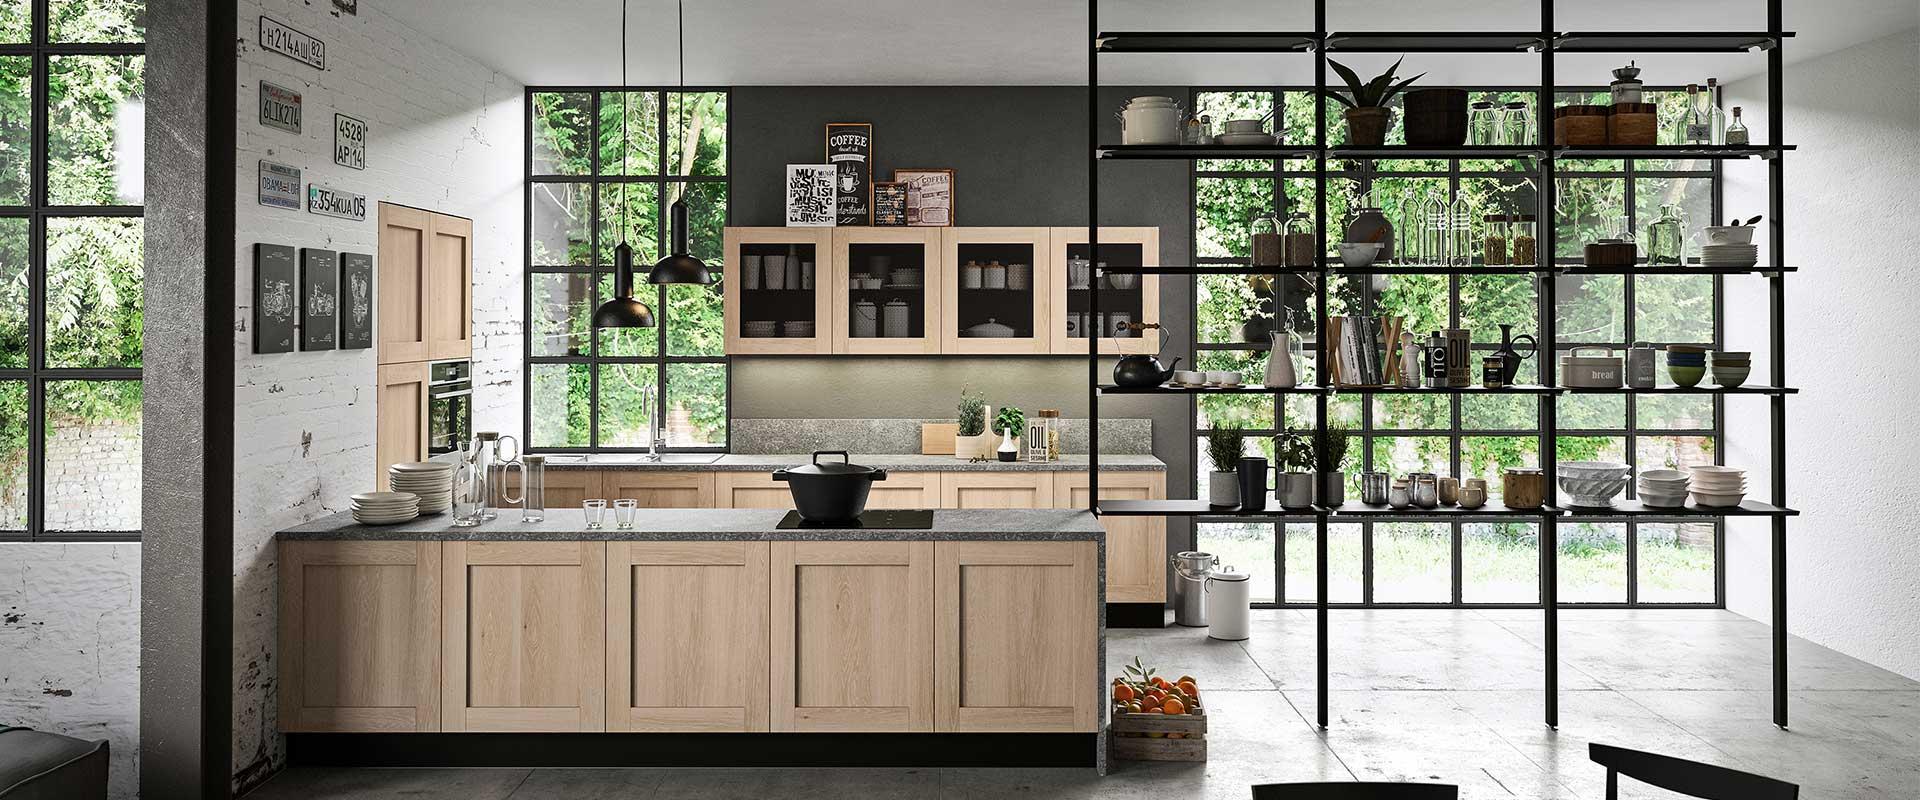 Aran cucine ylenia cucine aran roma ylenia cucina aran modello ylenia prezzo volare cucina - Aran cucine opinioni ...